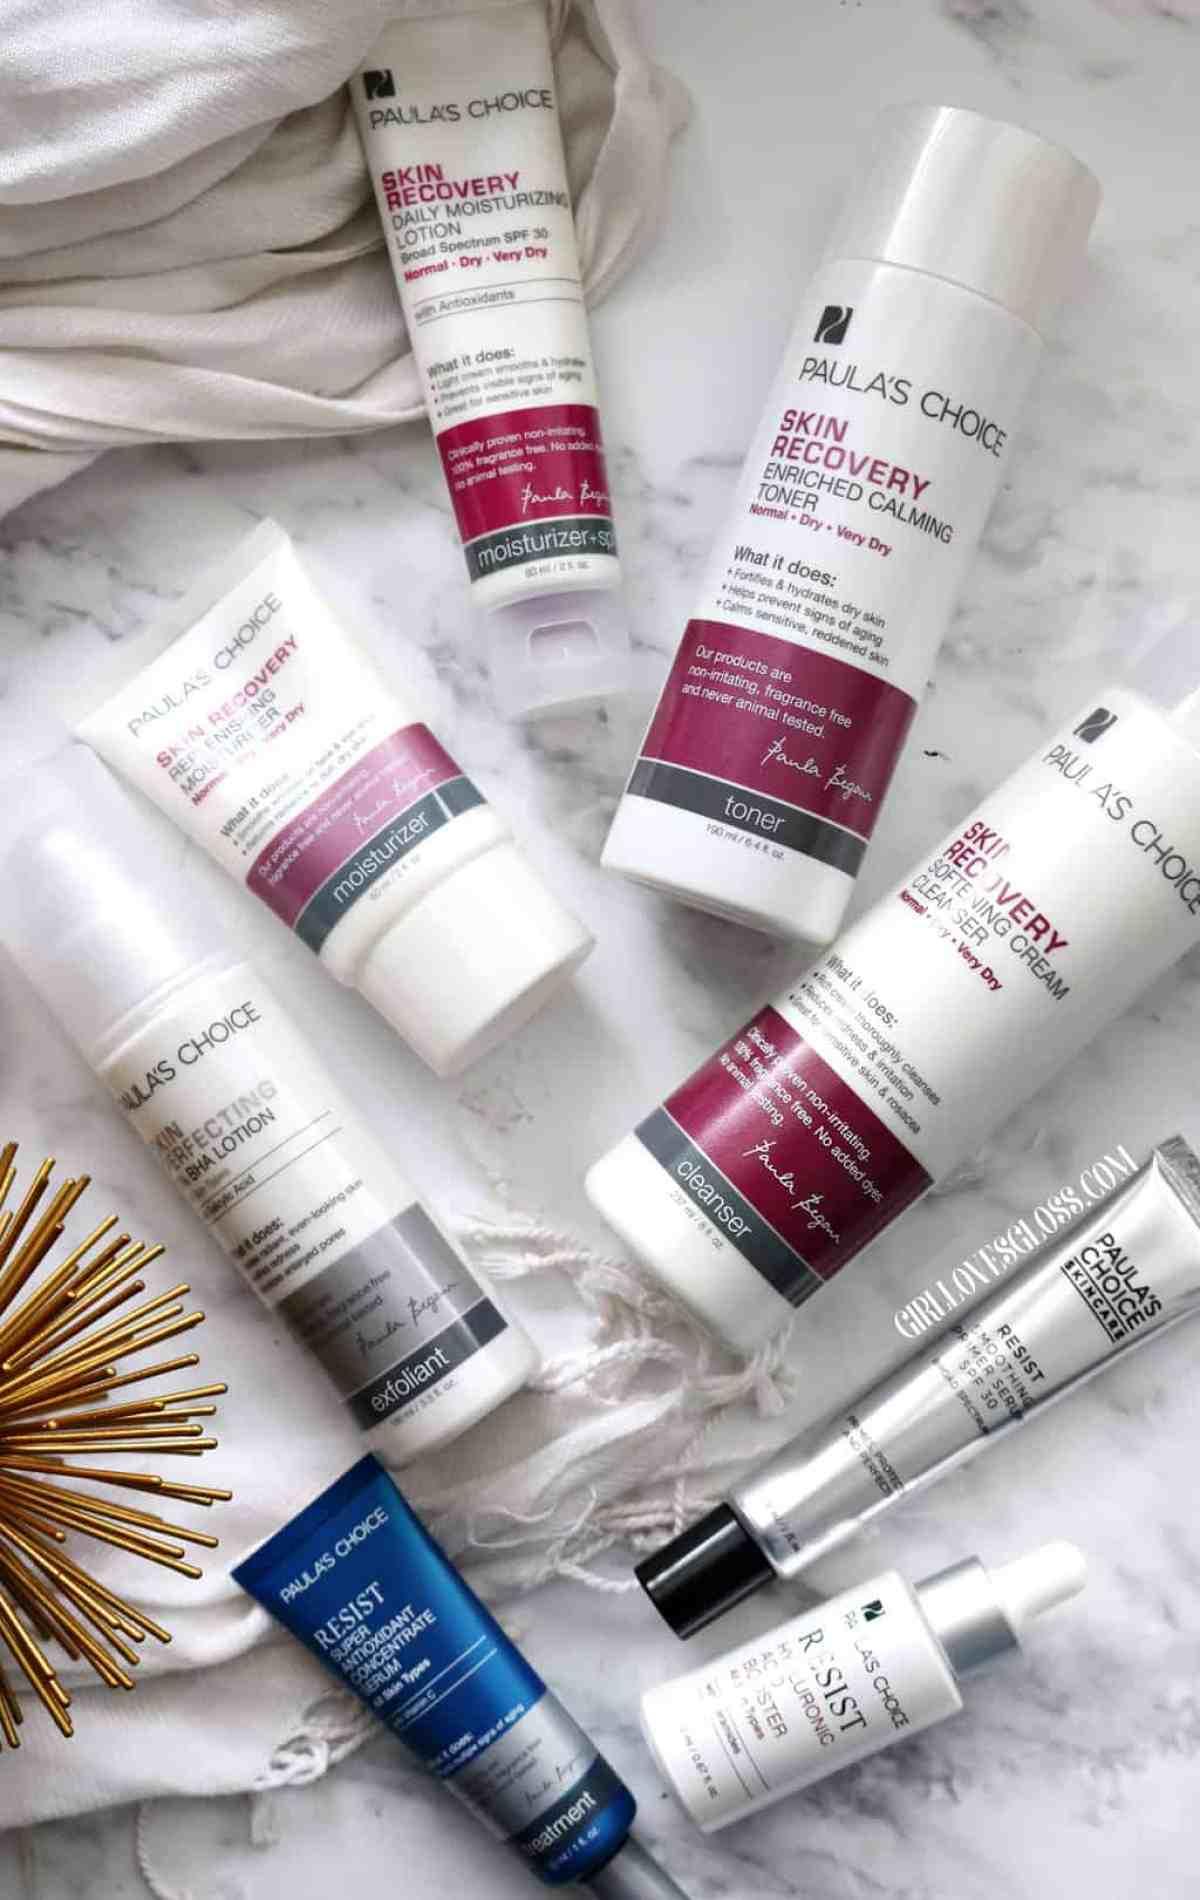 Save $10 off $40 on Paula's Choice Skincare with Code PRIMP10